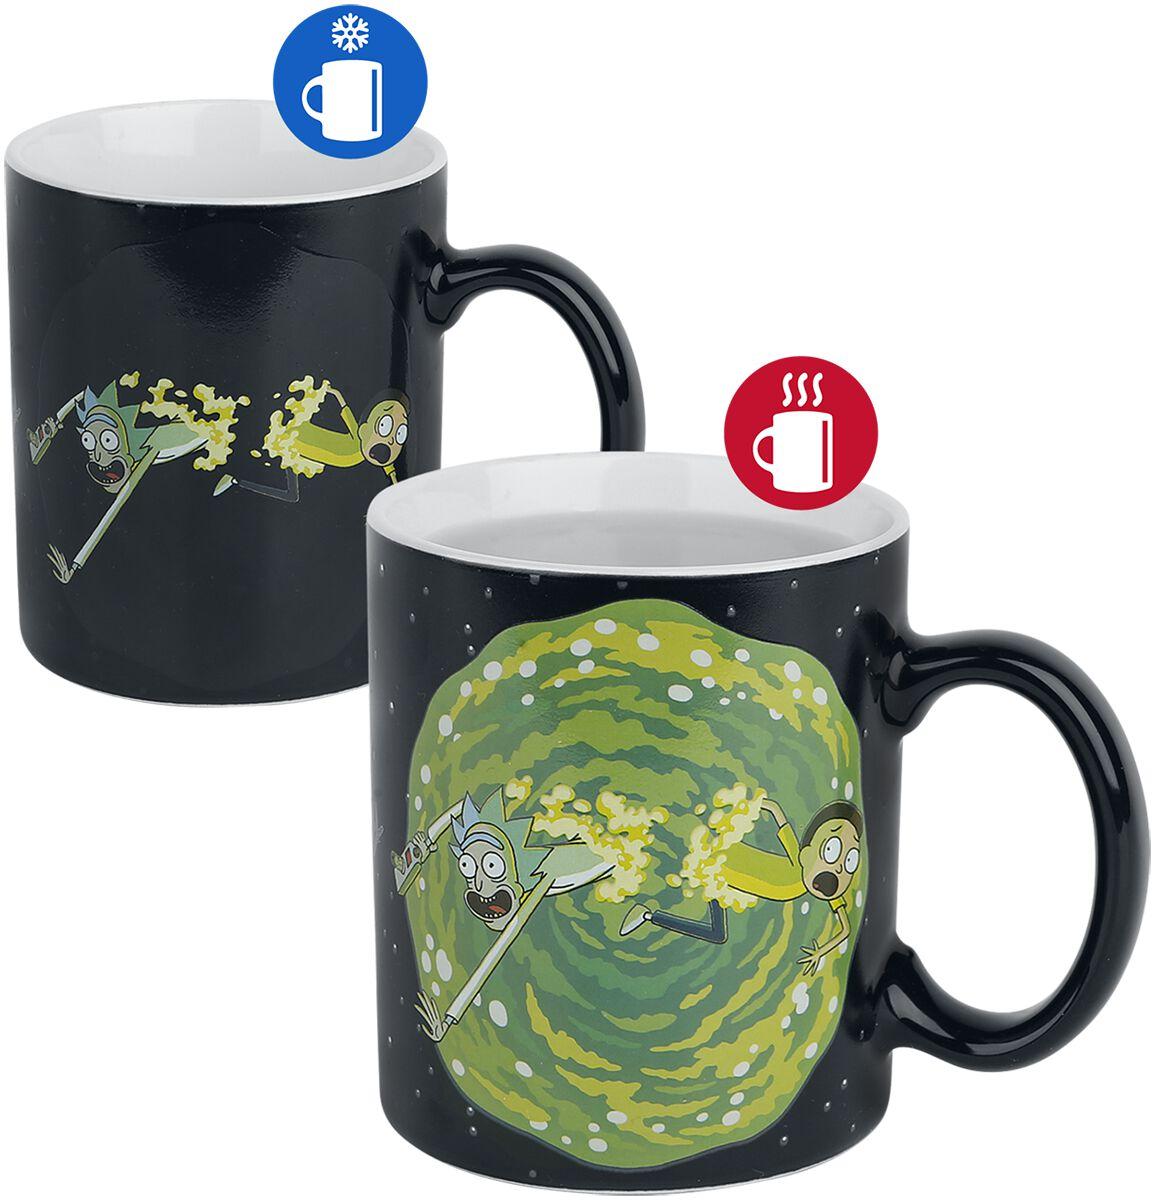 Rick And Morty Portal - Tasse mit Thermoeffekt Tasse multicolor MGH0053